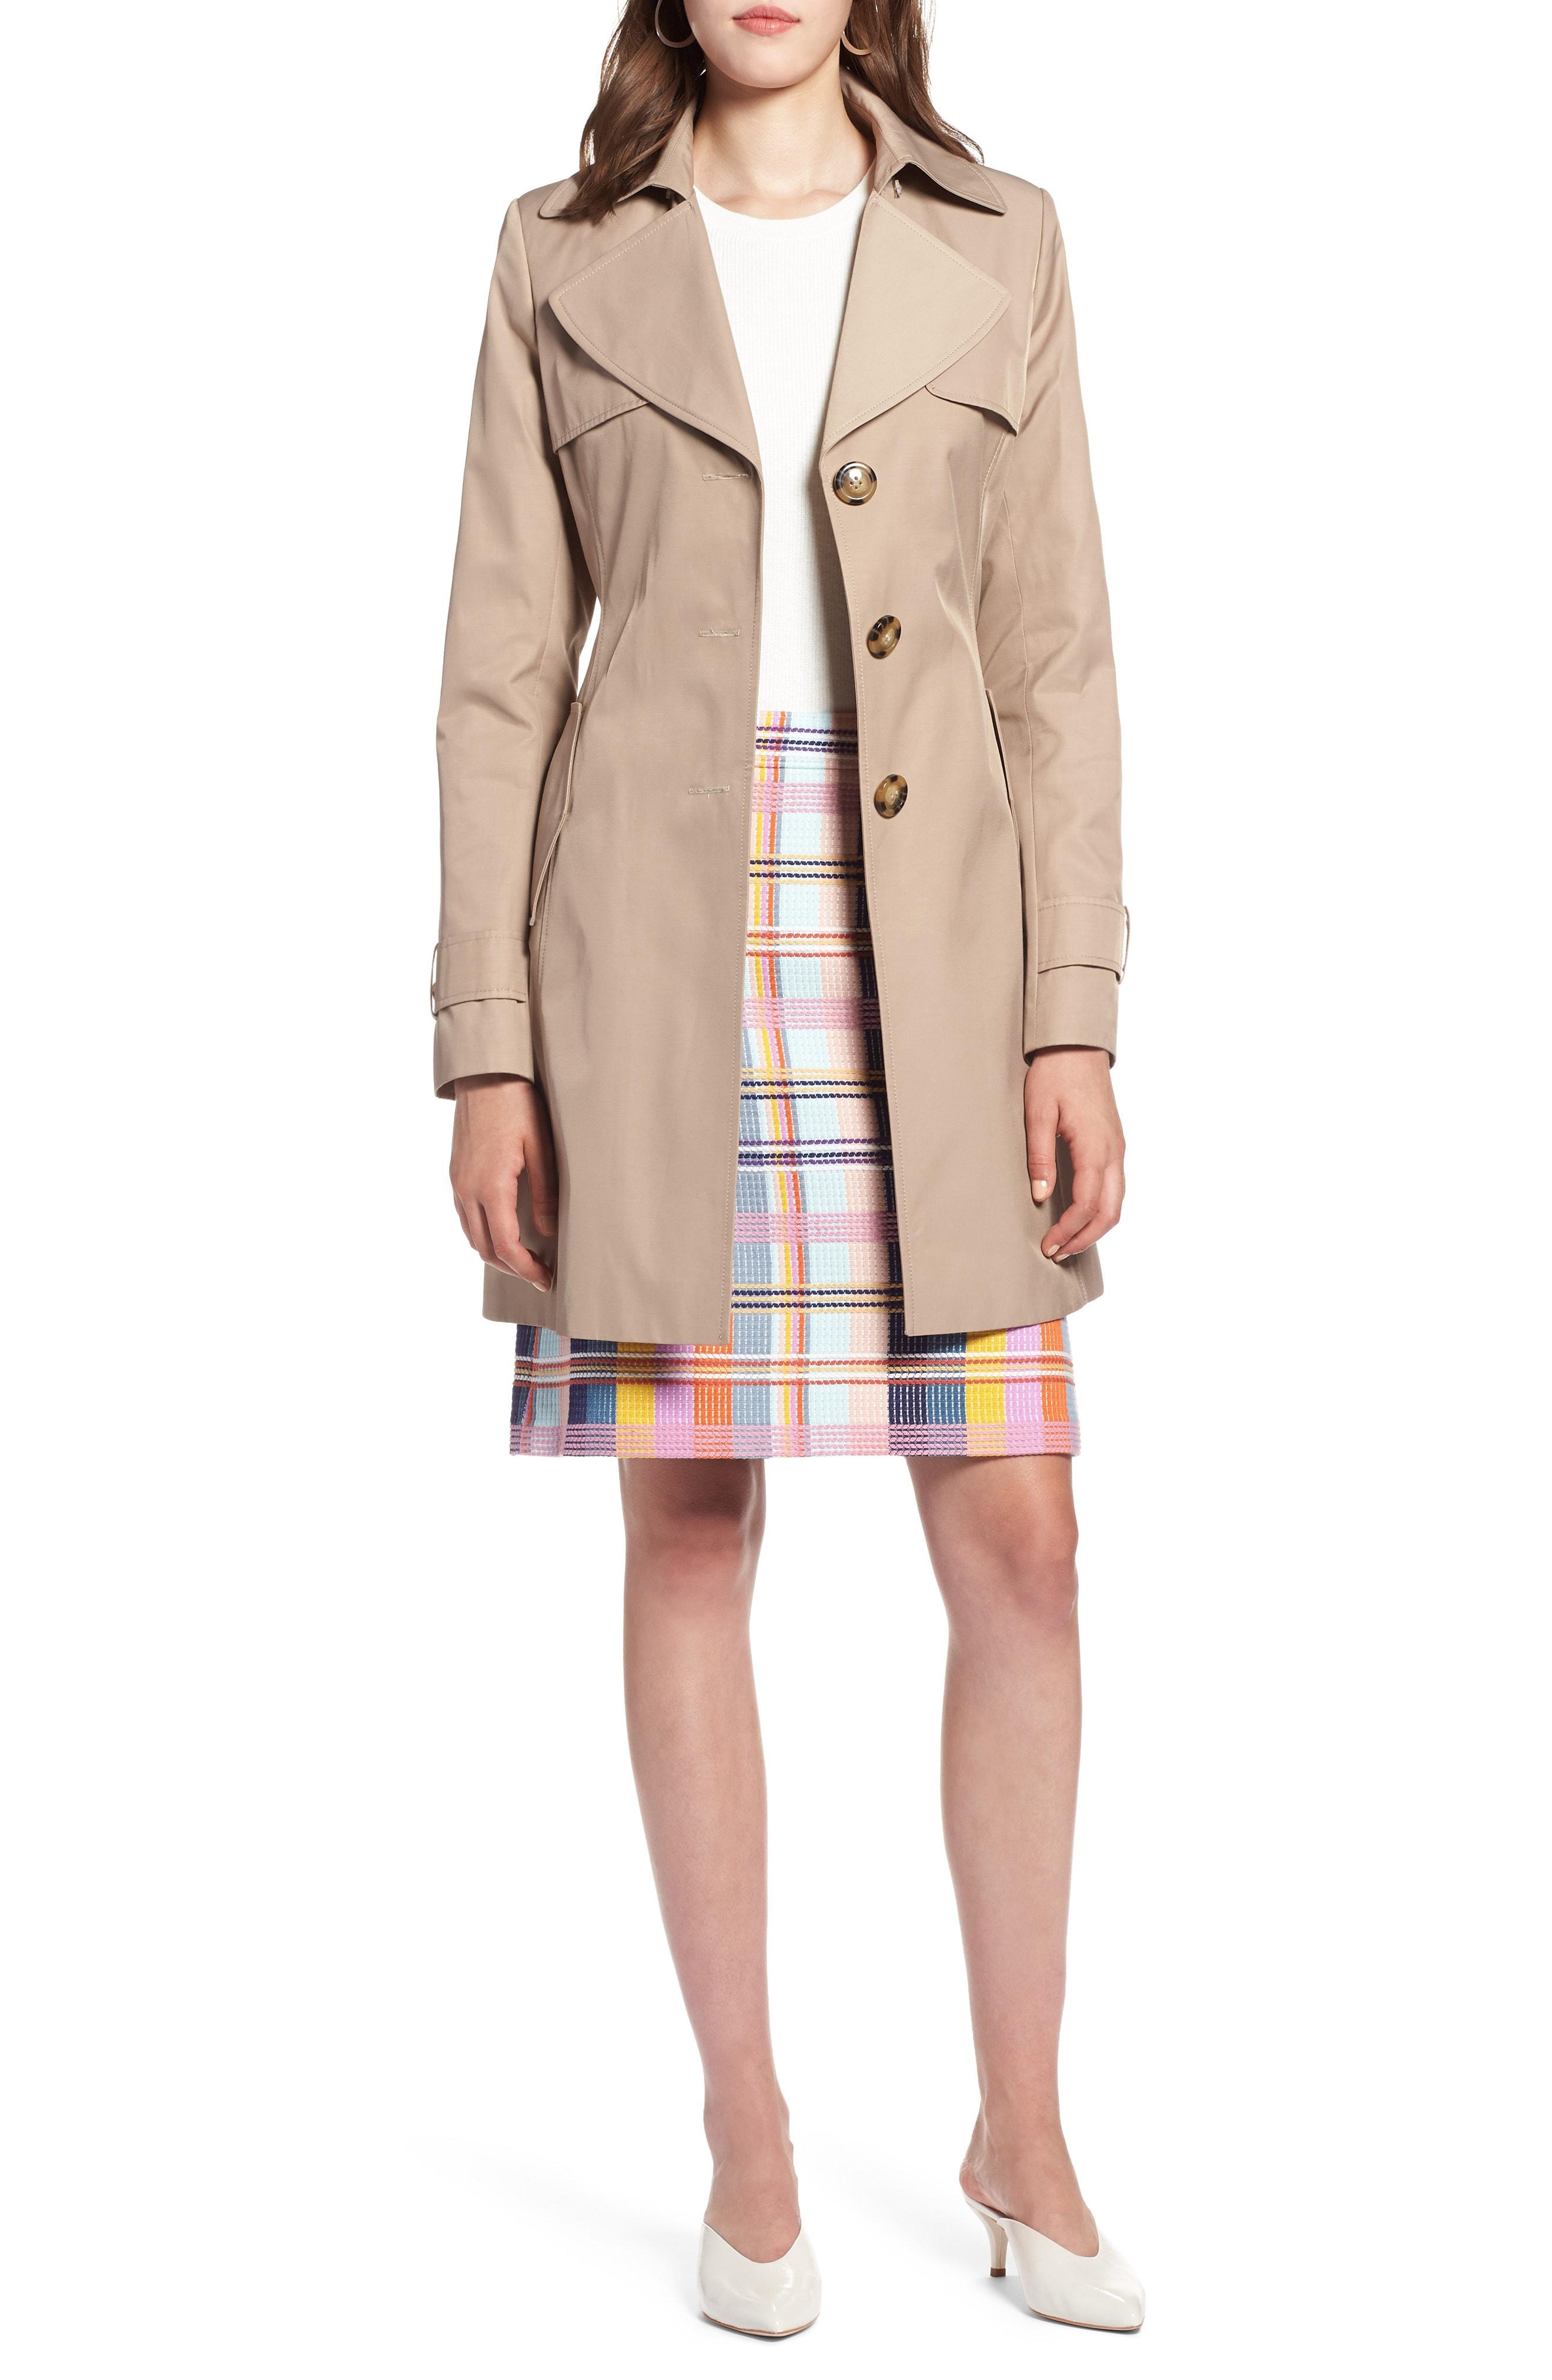 The evergreen fashion staple: Beige coats